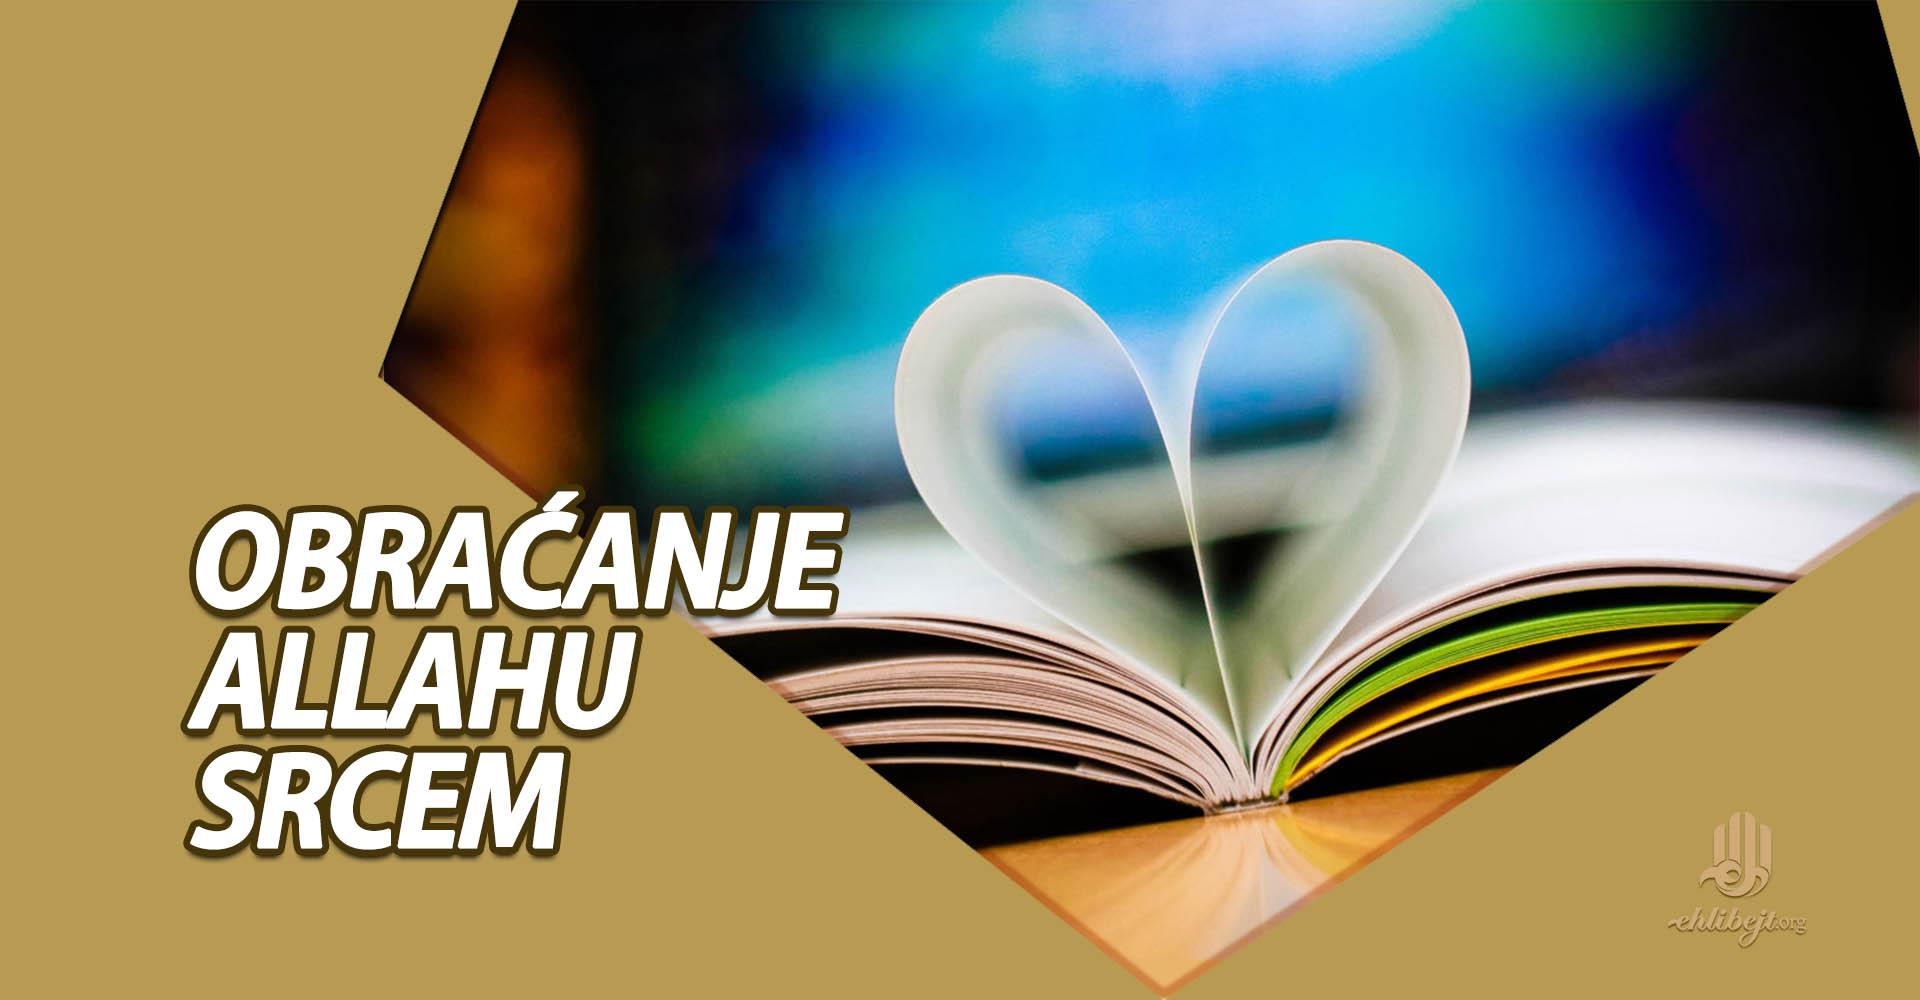 Obraćanje Allahu srcem